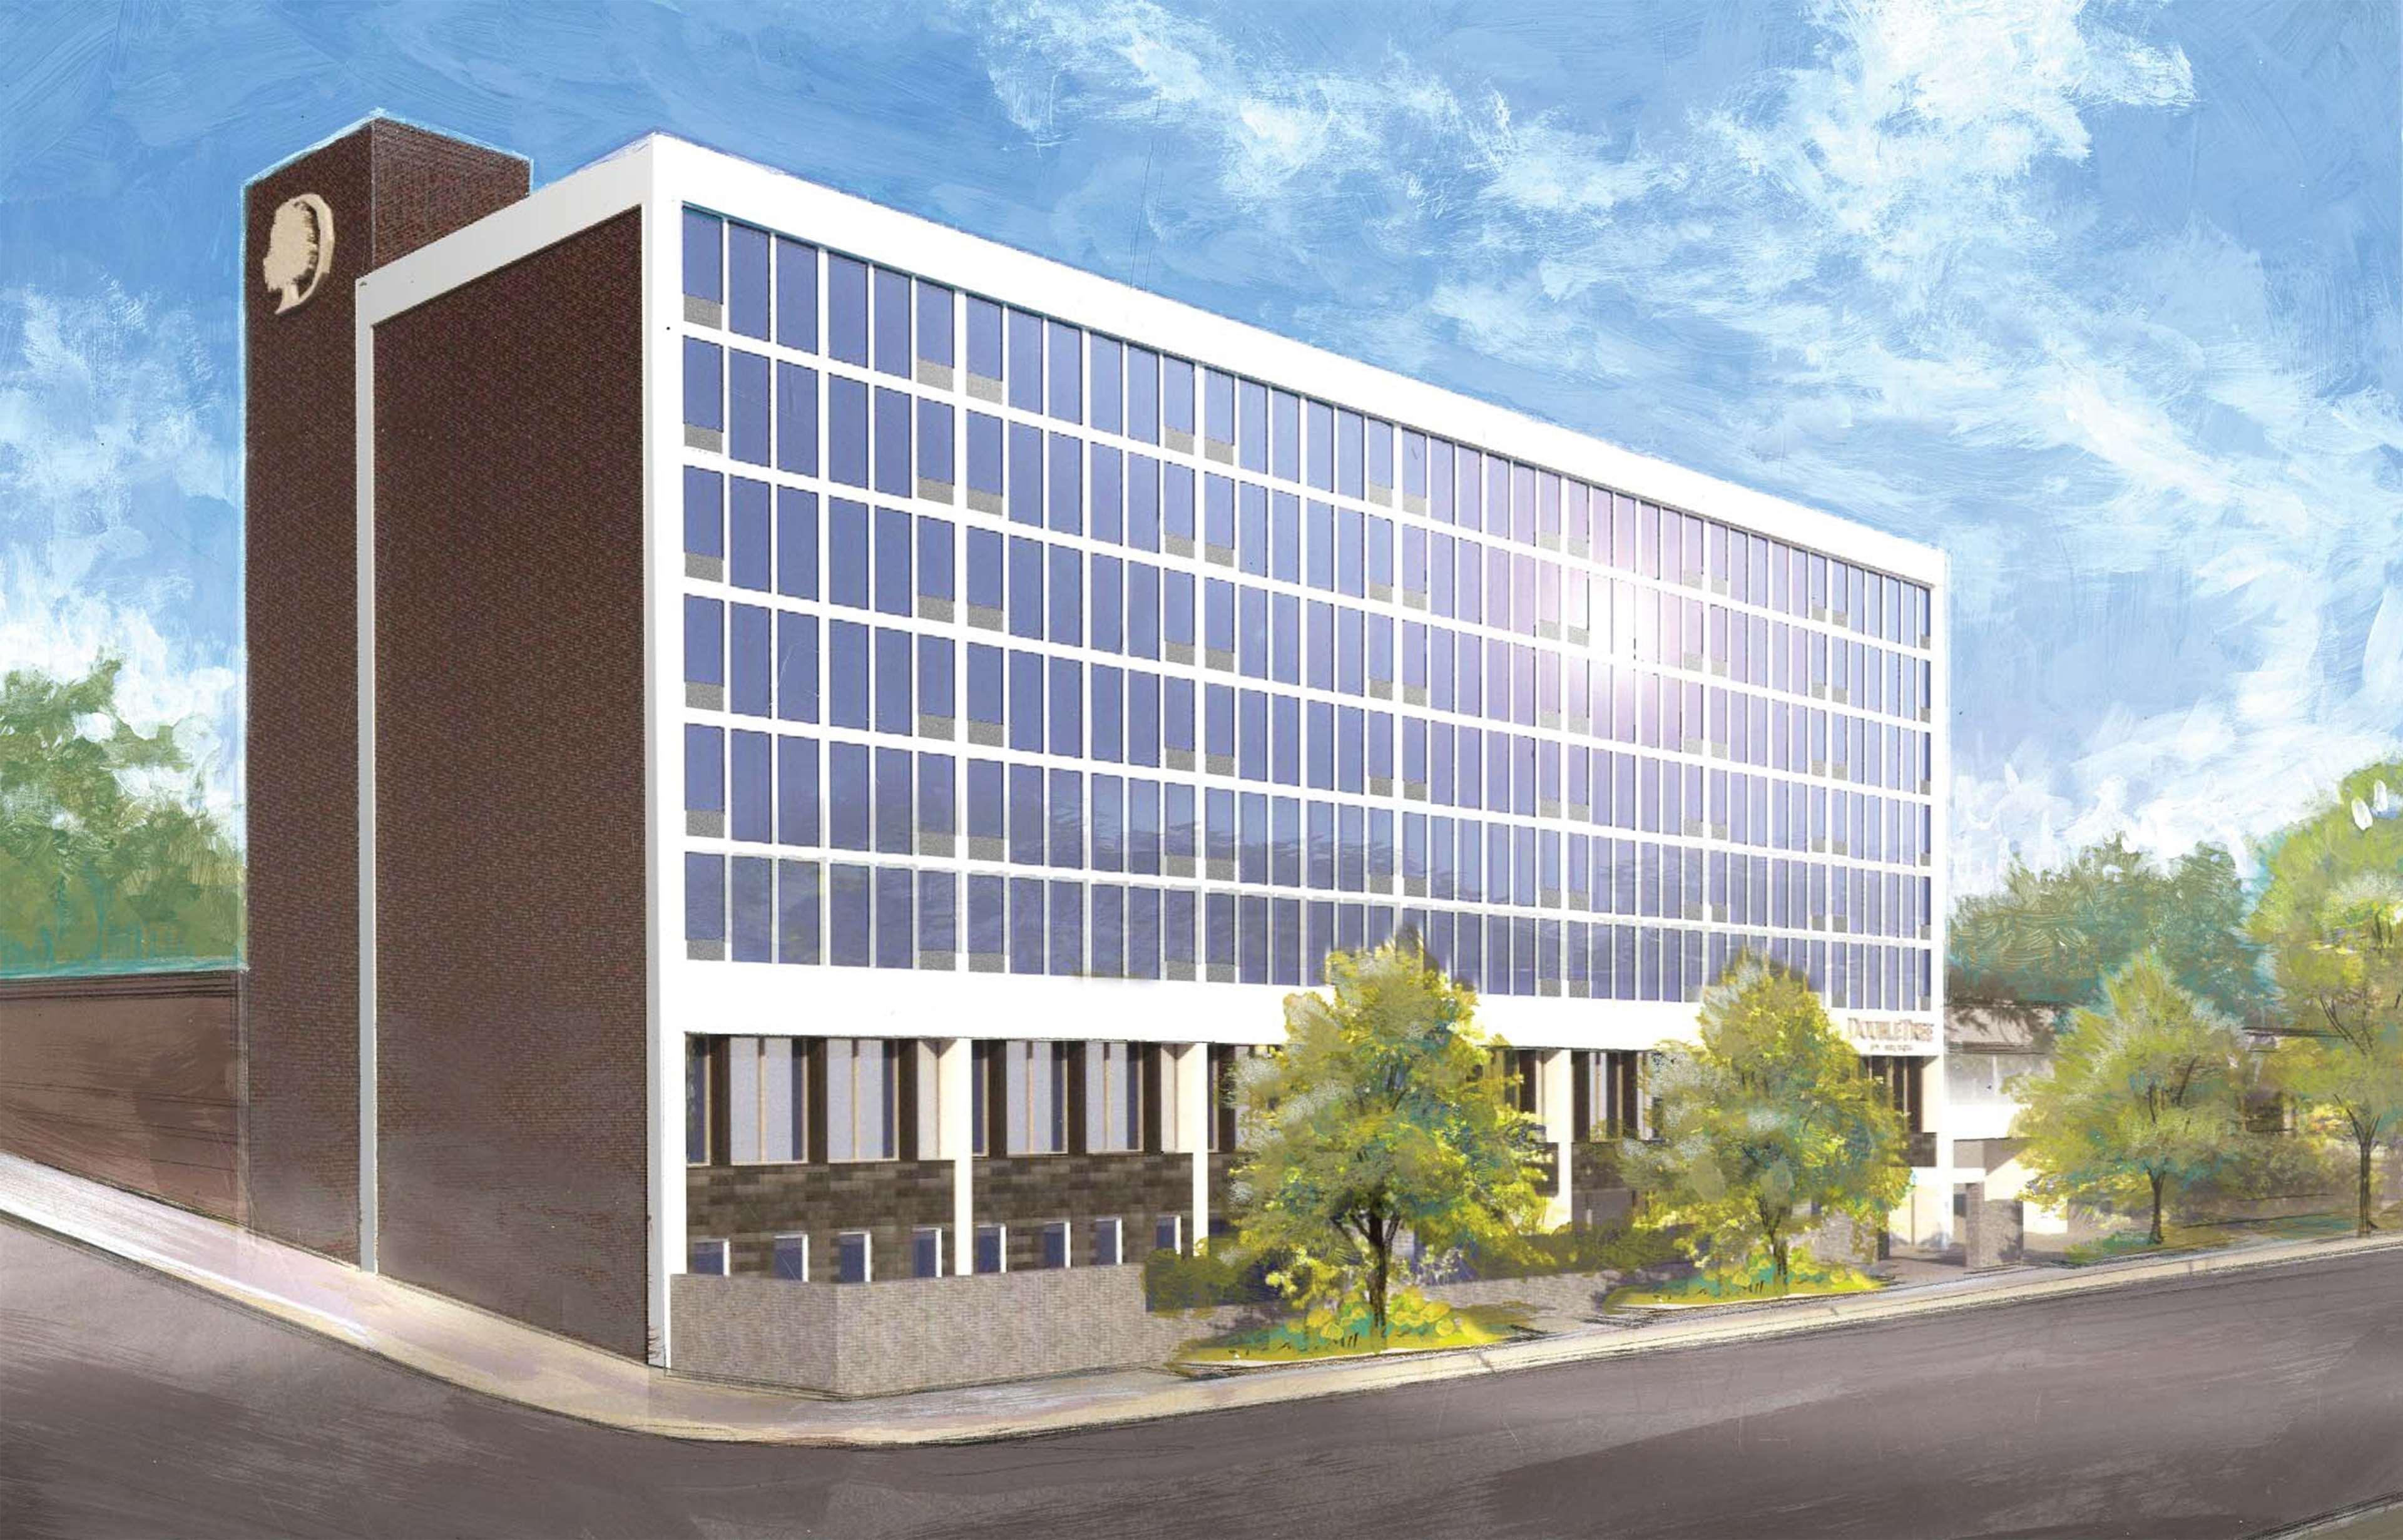 DoubleTree by Hilton Jamestown image 1